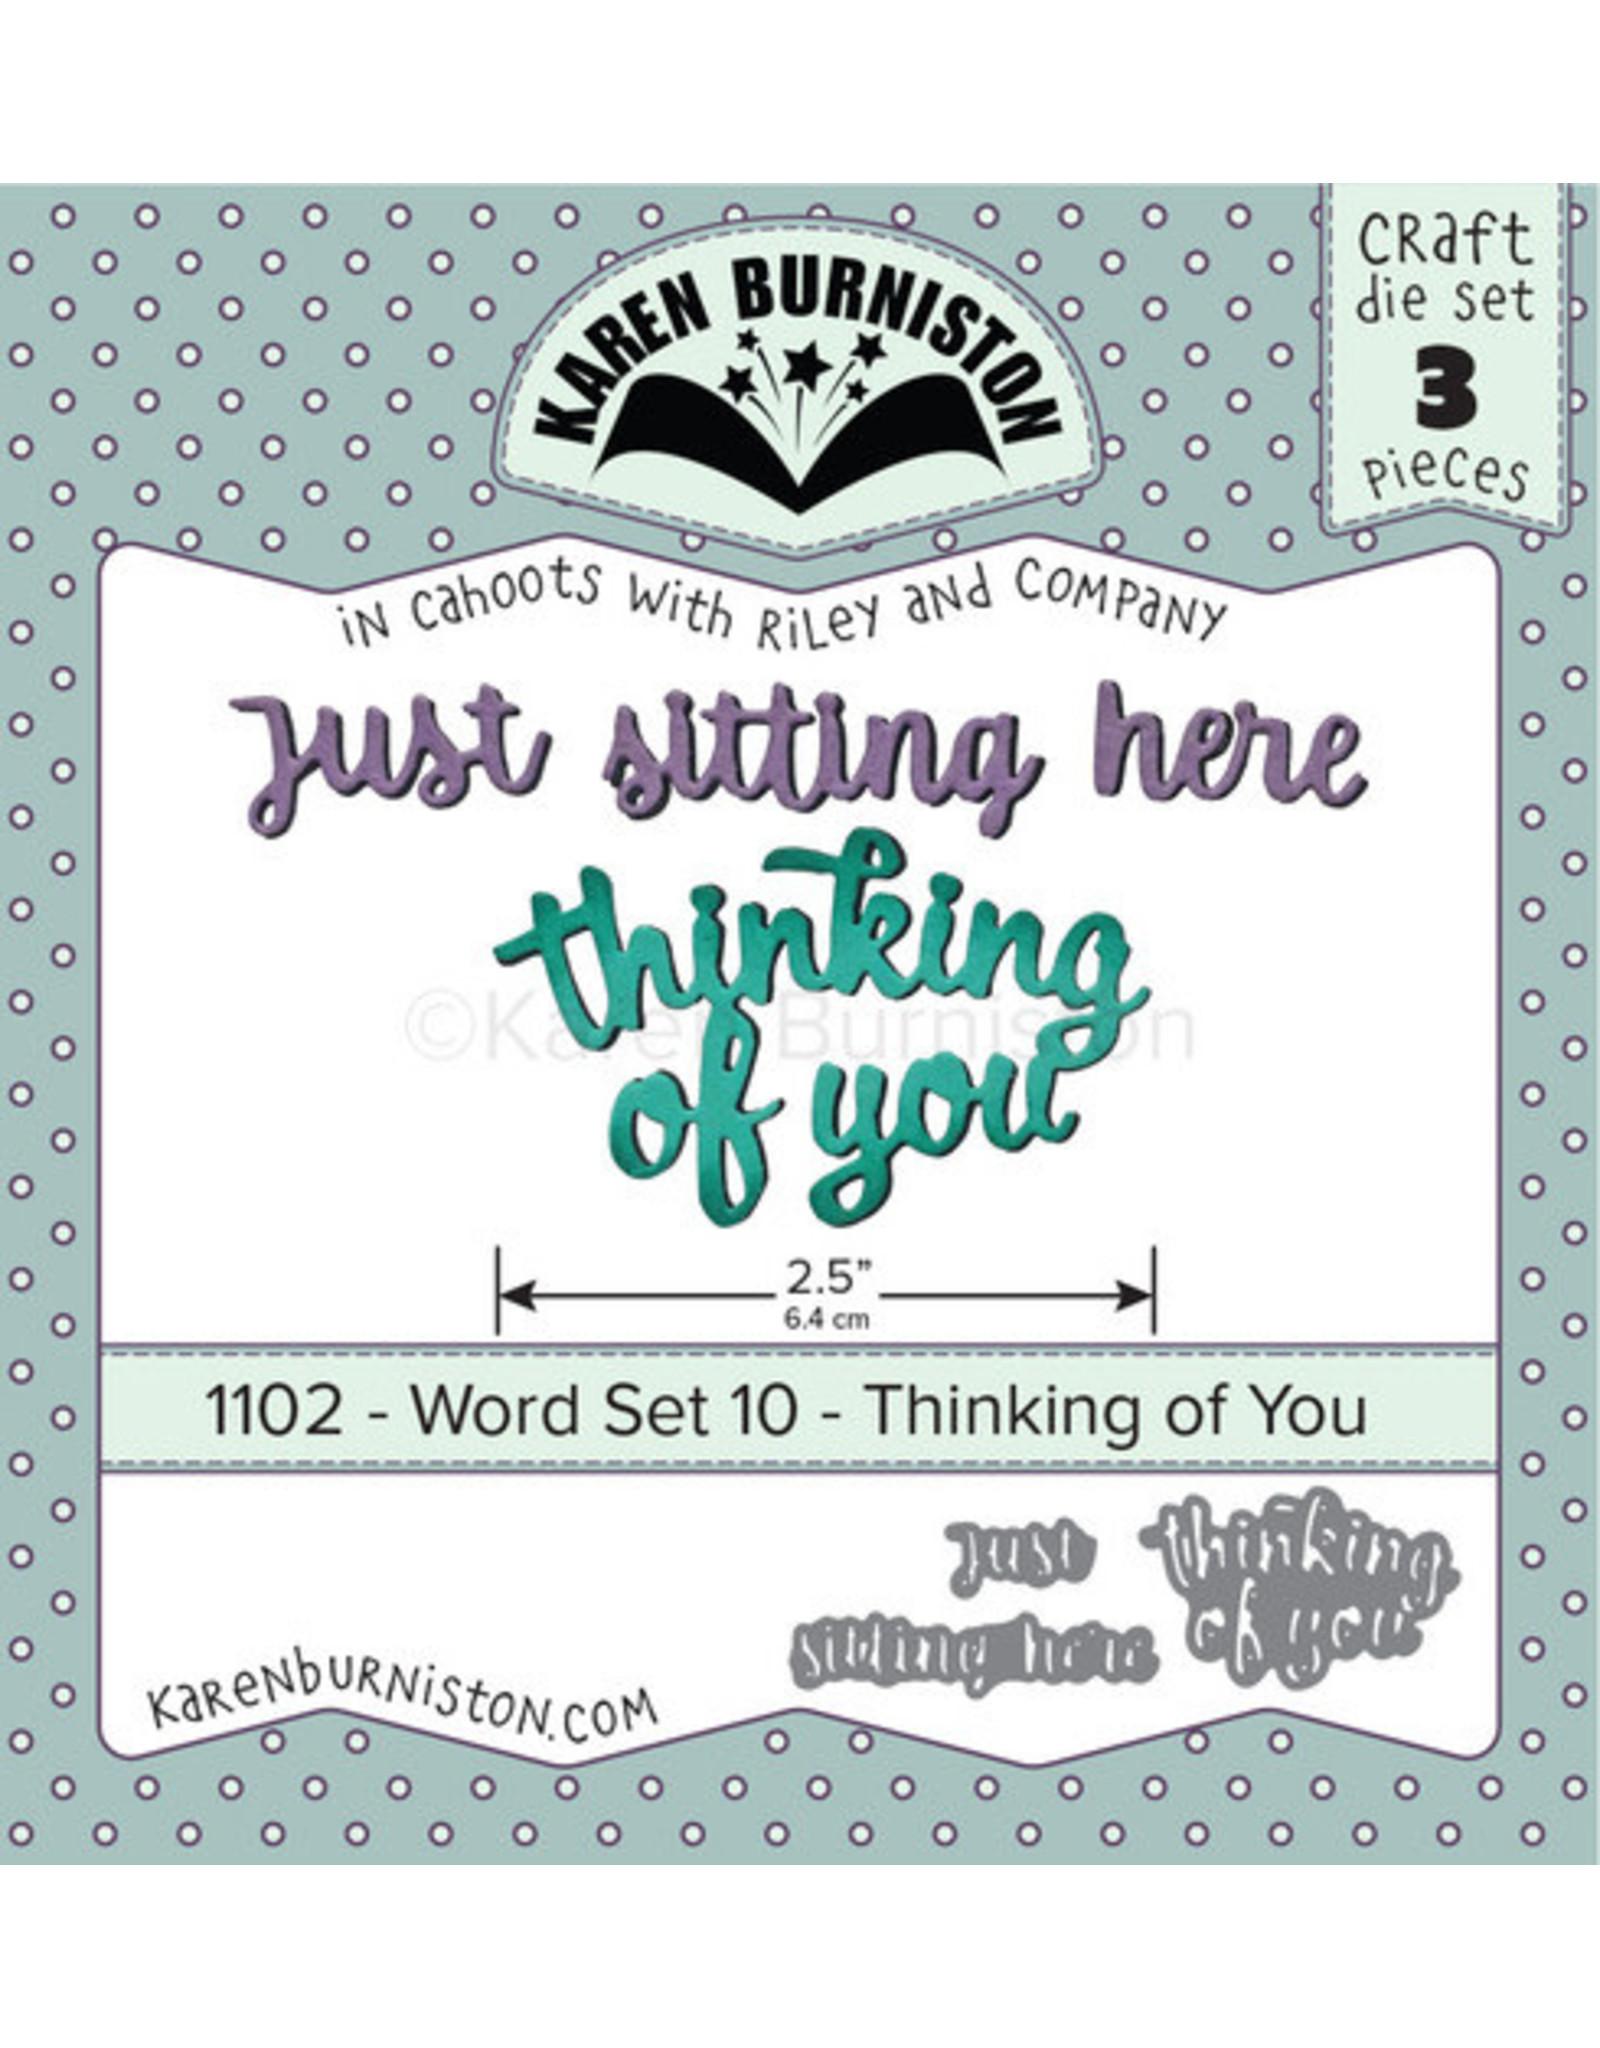 Karen Burniston Karen Burniston Word Set 10 Thinking of you 1102